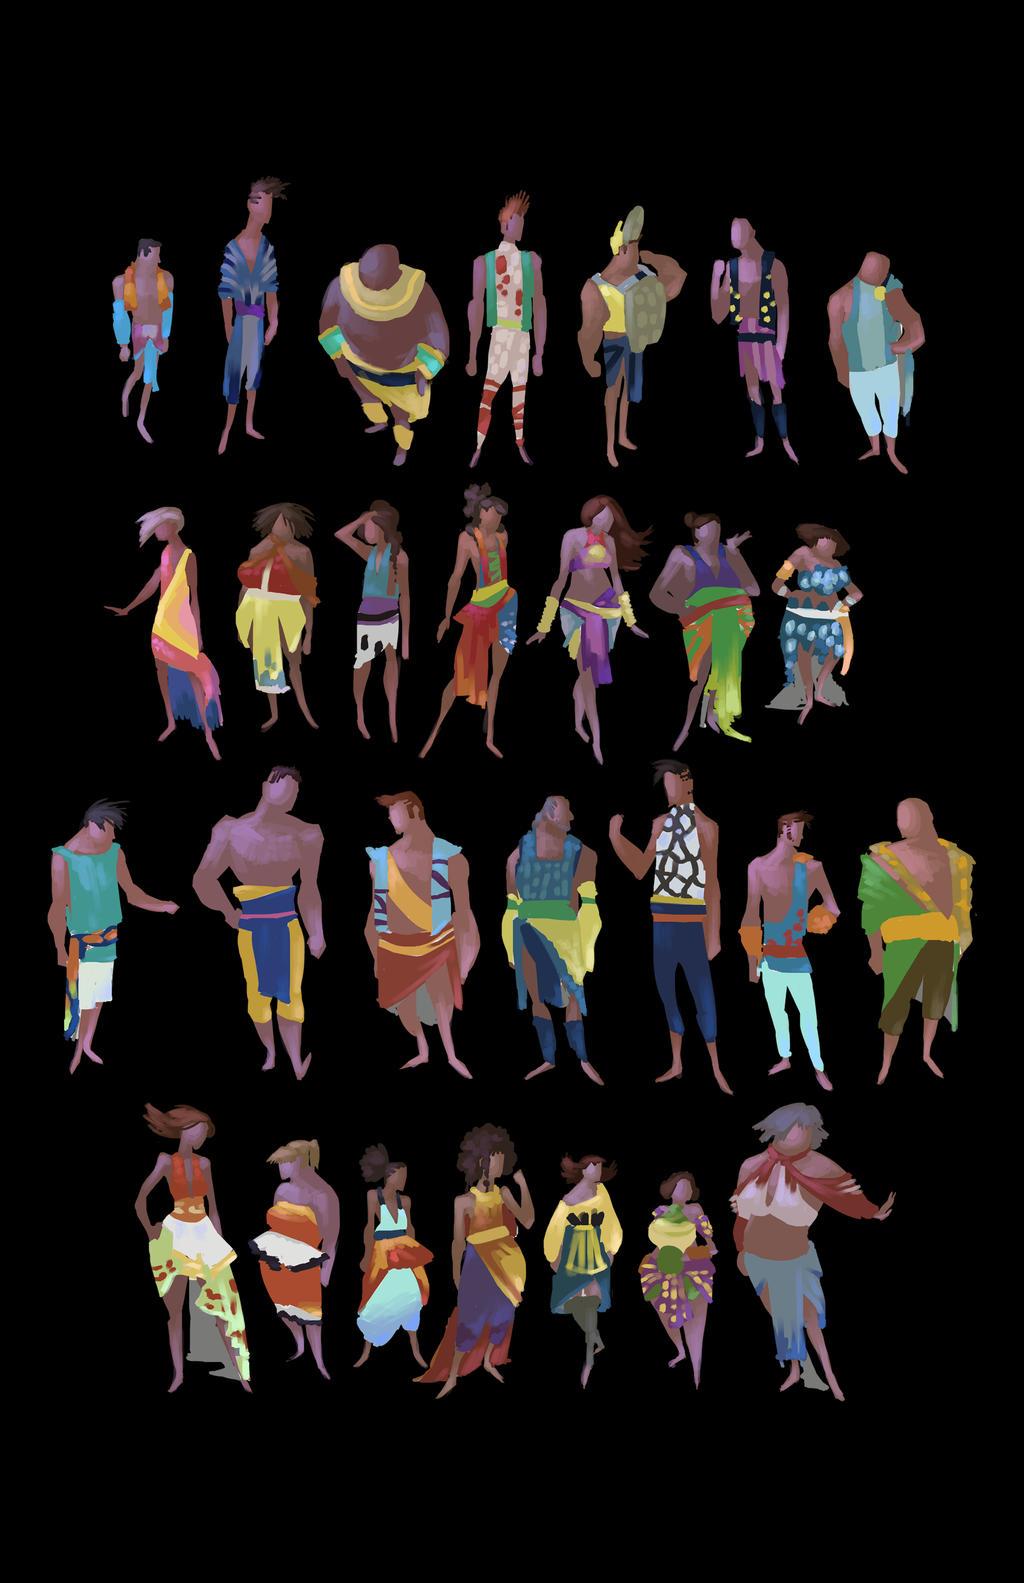 Costume Color Thumbnail Sketches - Atlantis